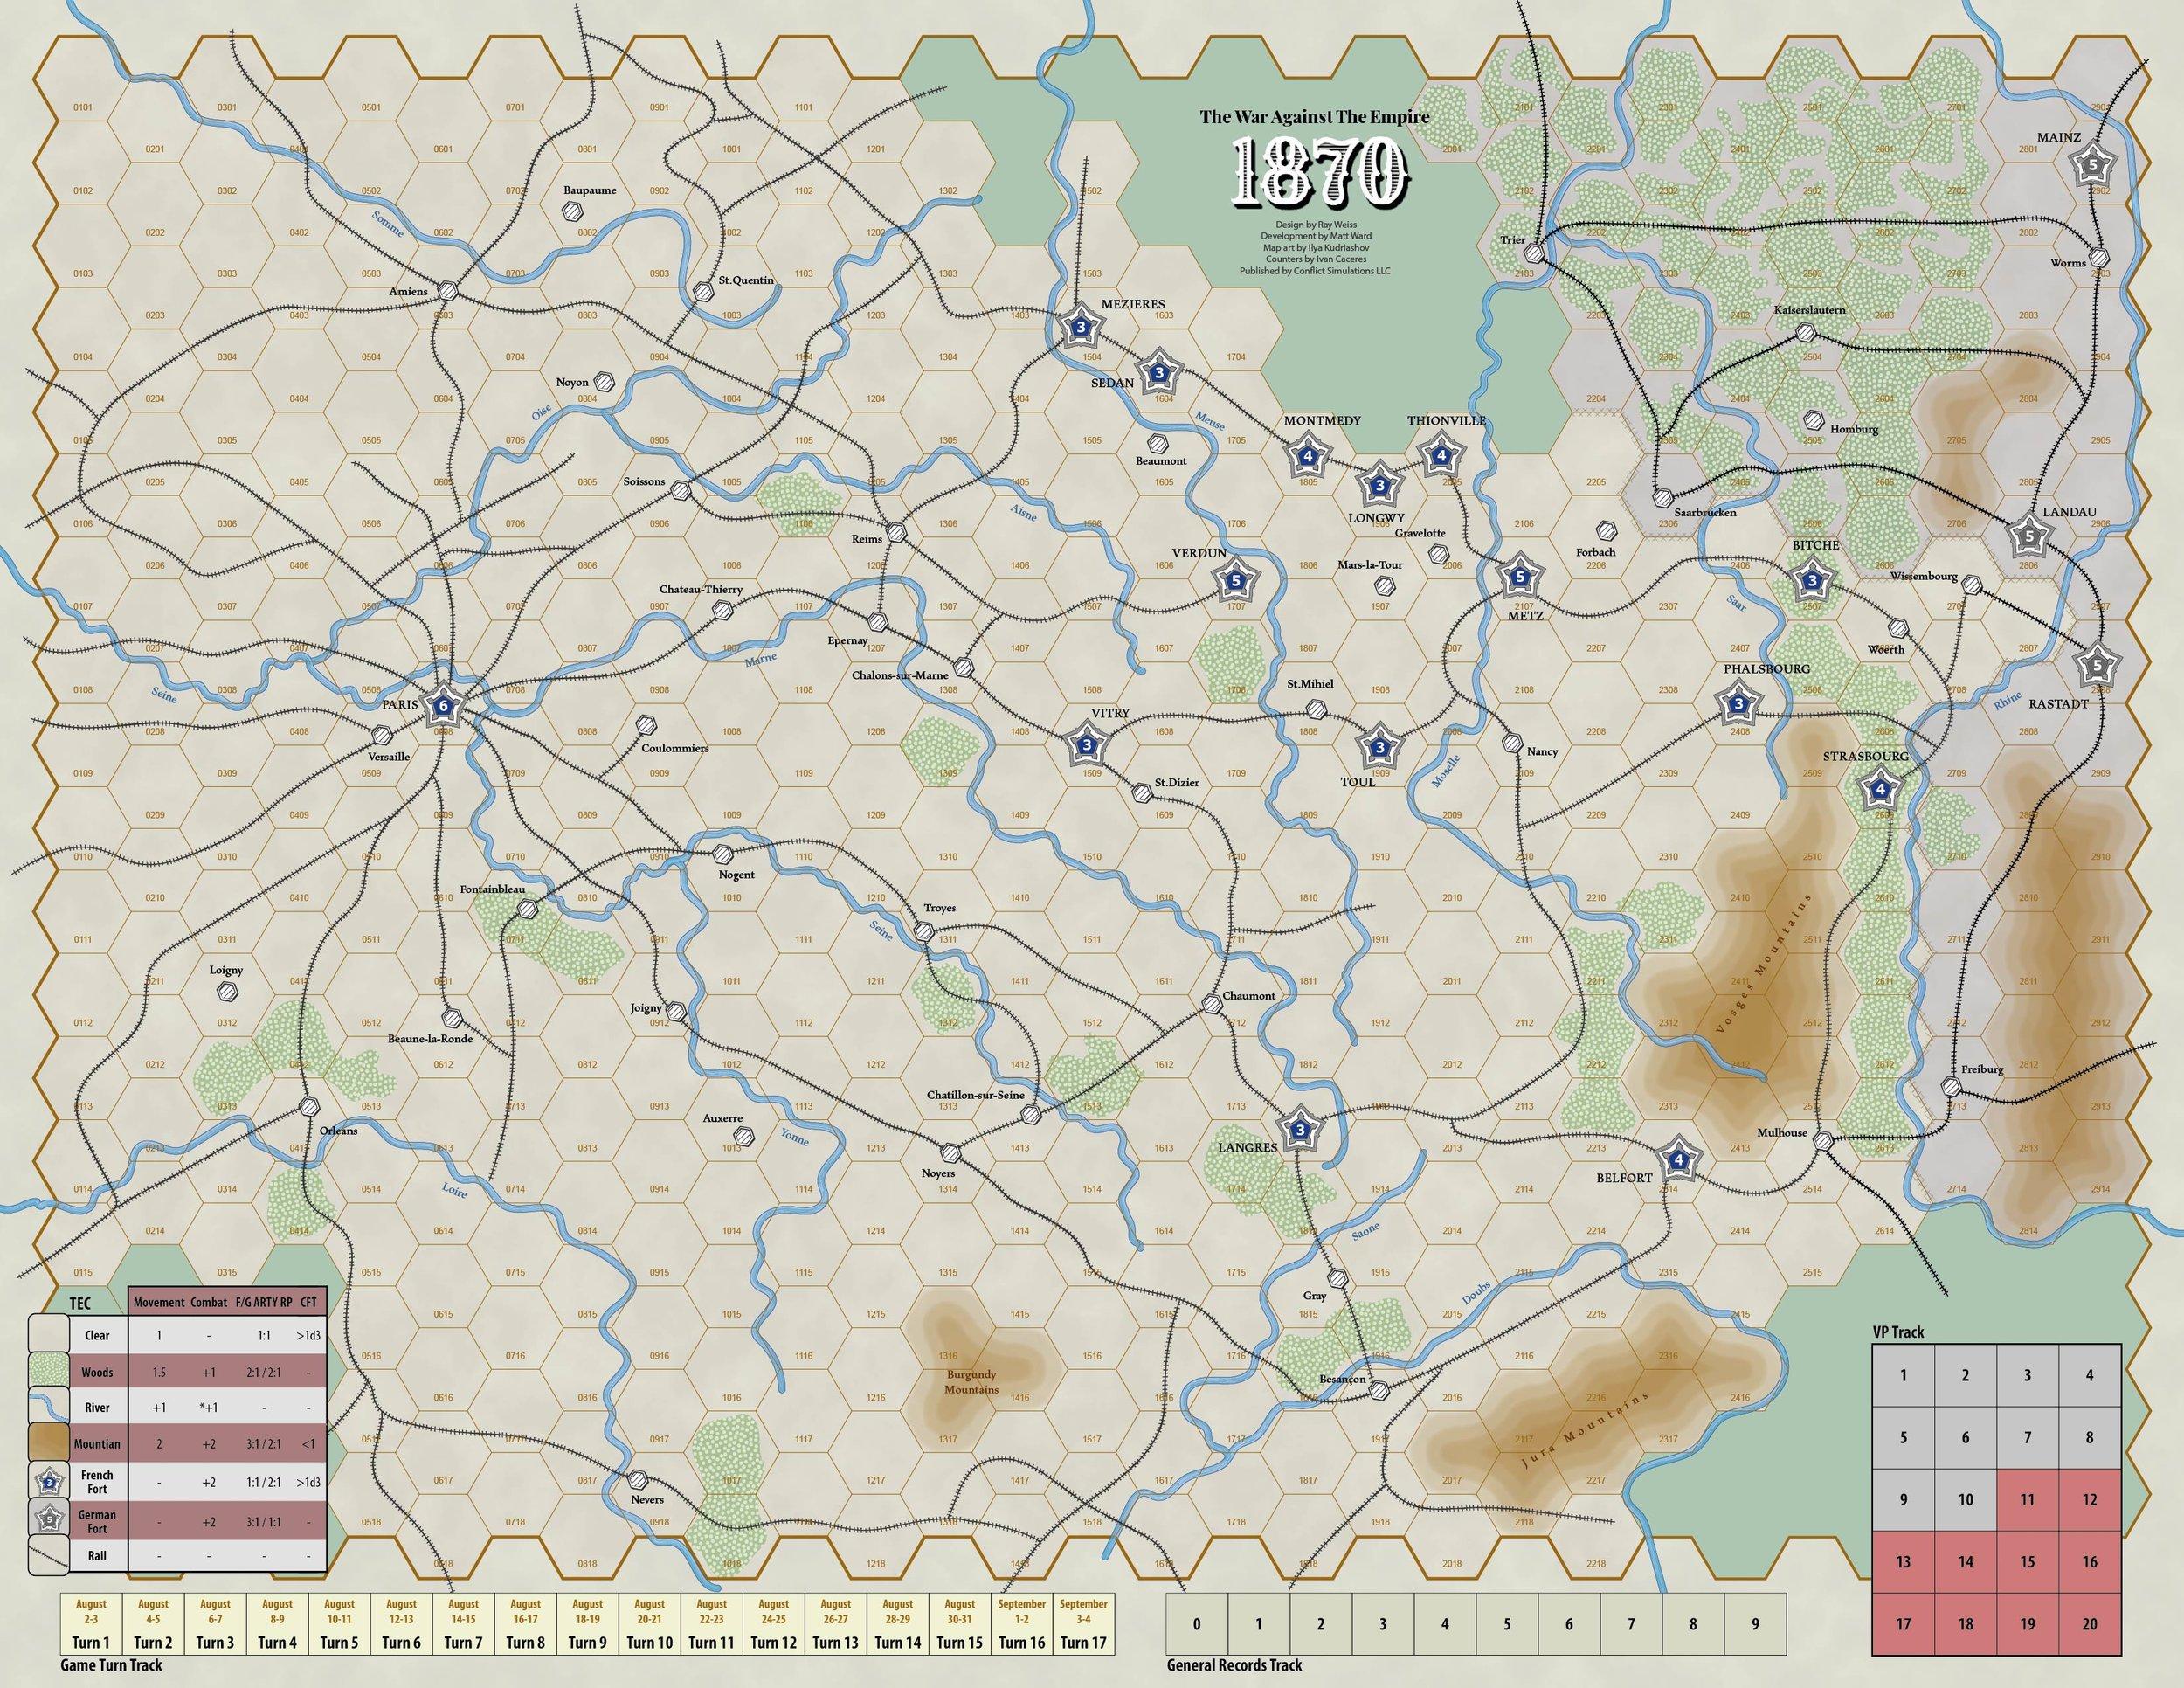 1870_map(5).jpg